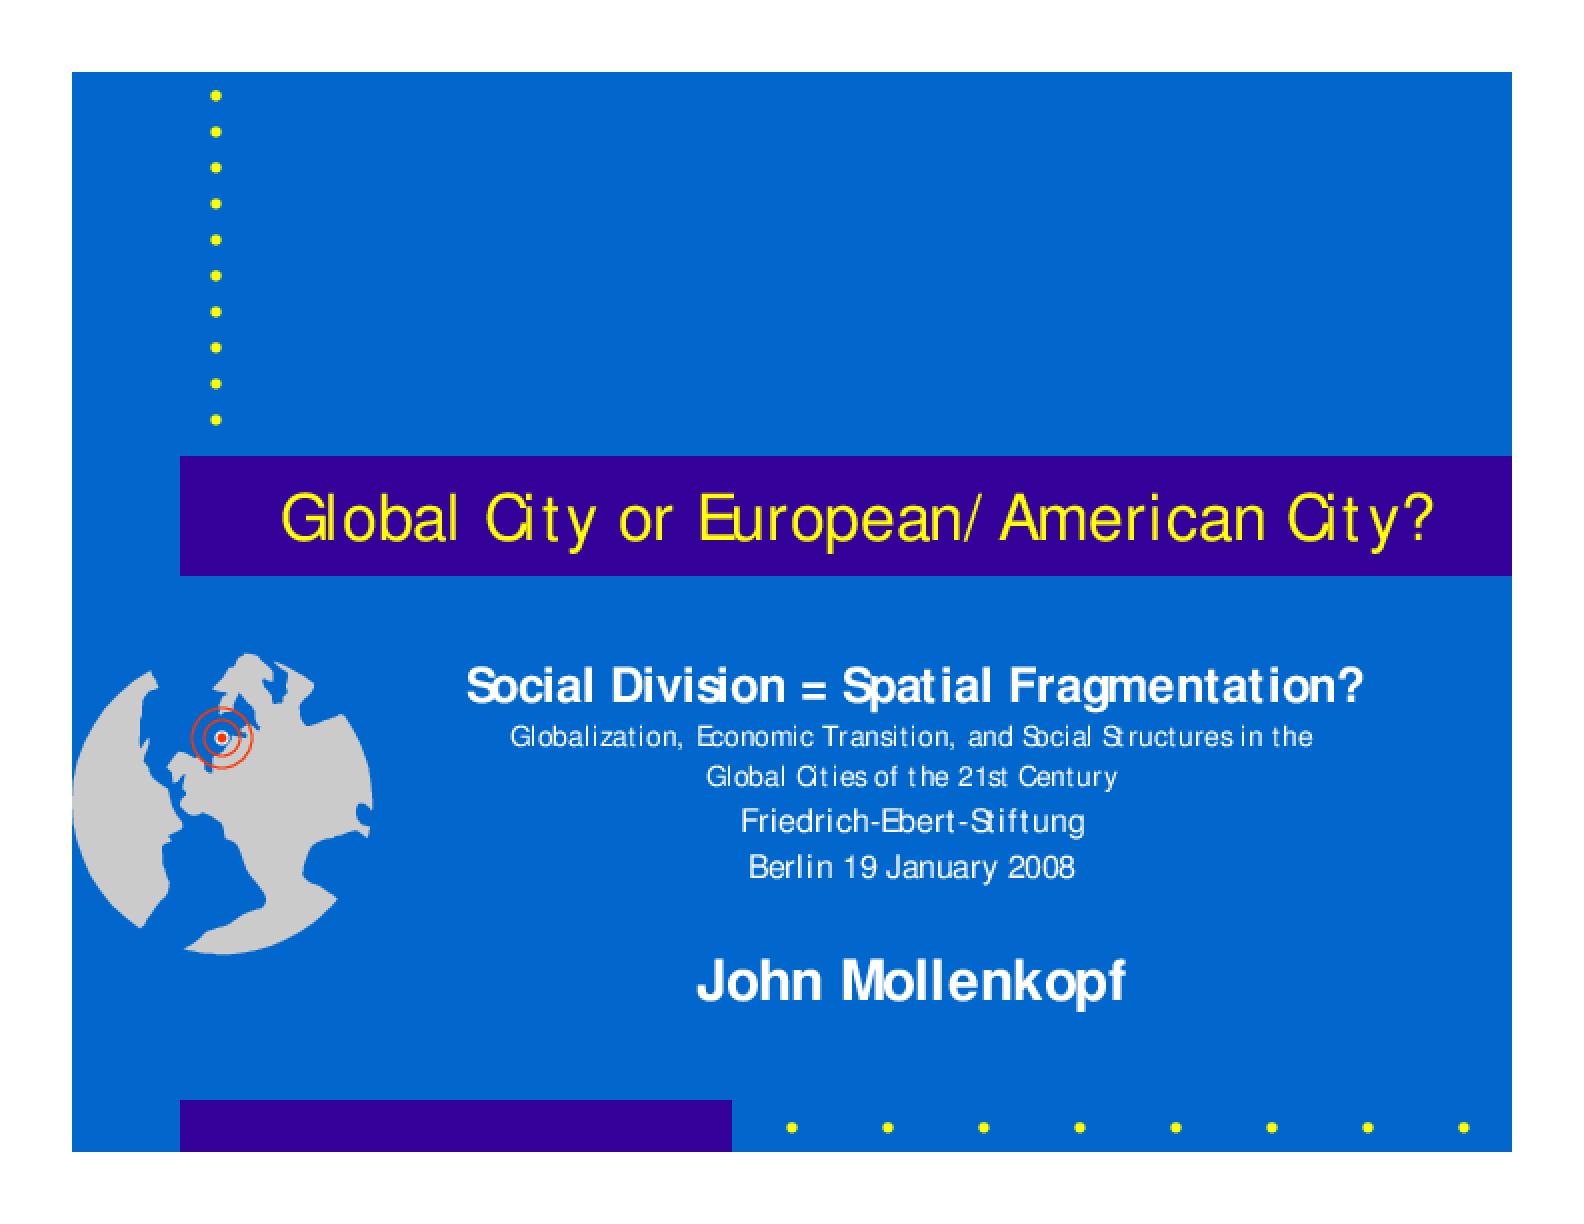 Global City or European/American City?